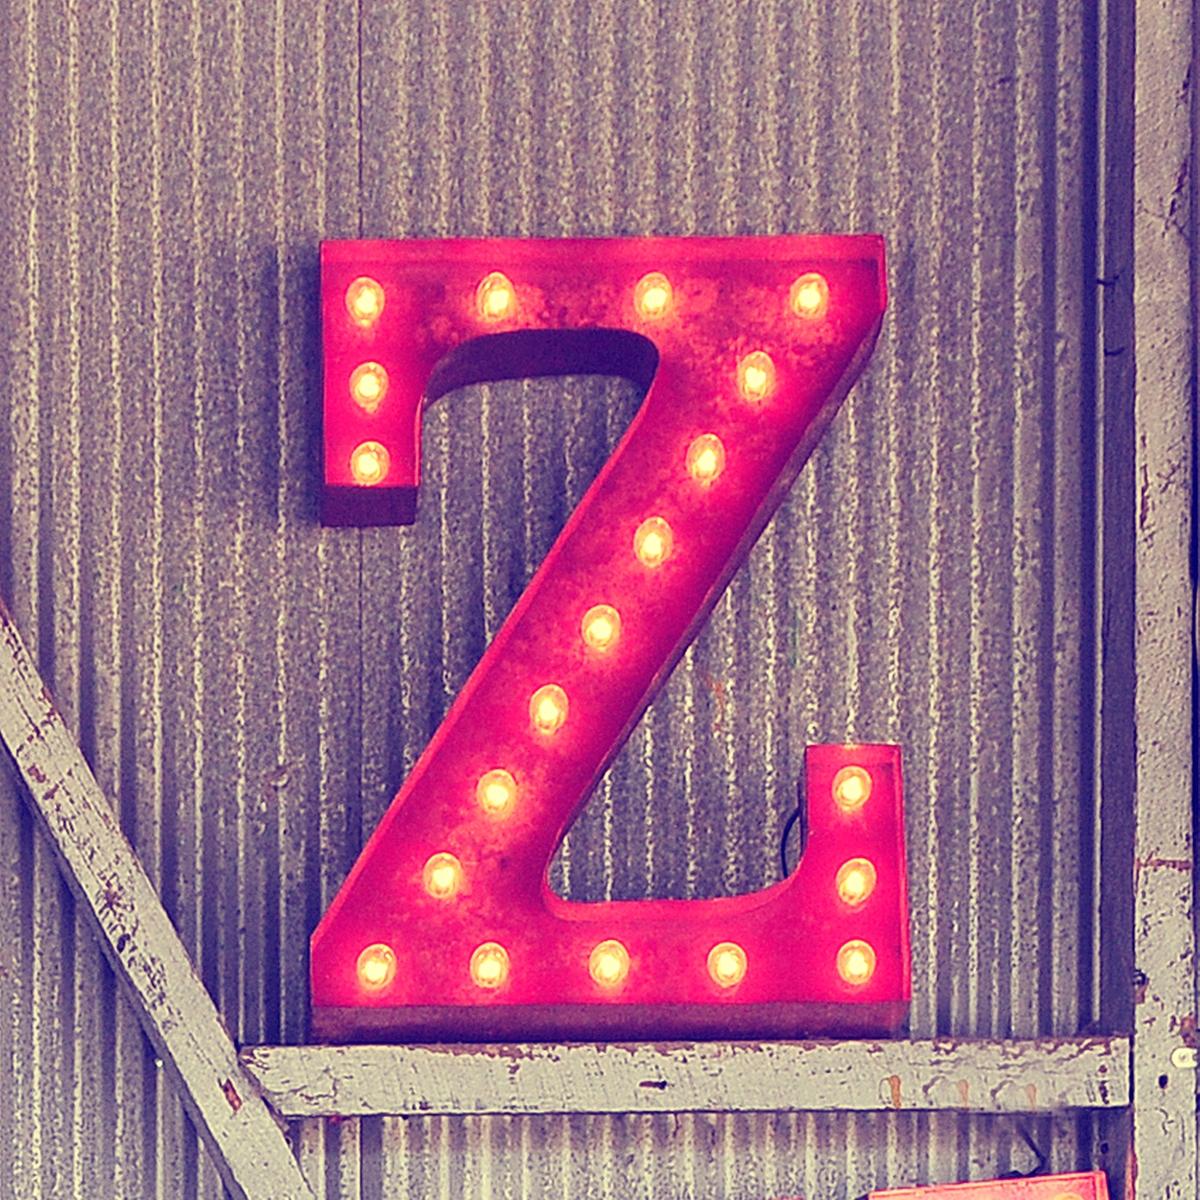 صور حرف Z صور رائعه لحرف Z صور بنات